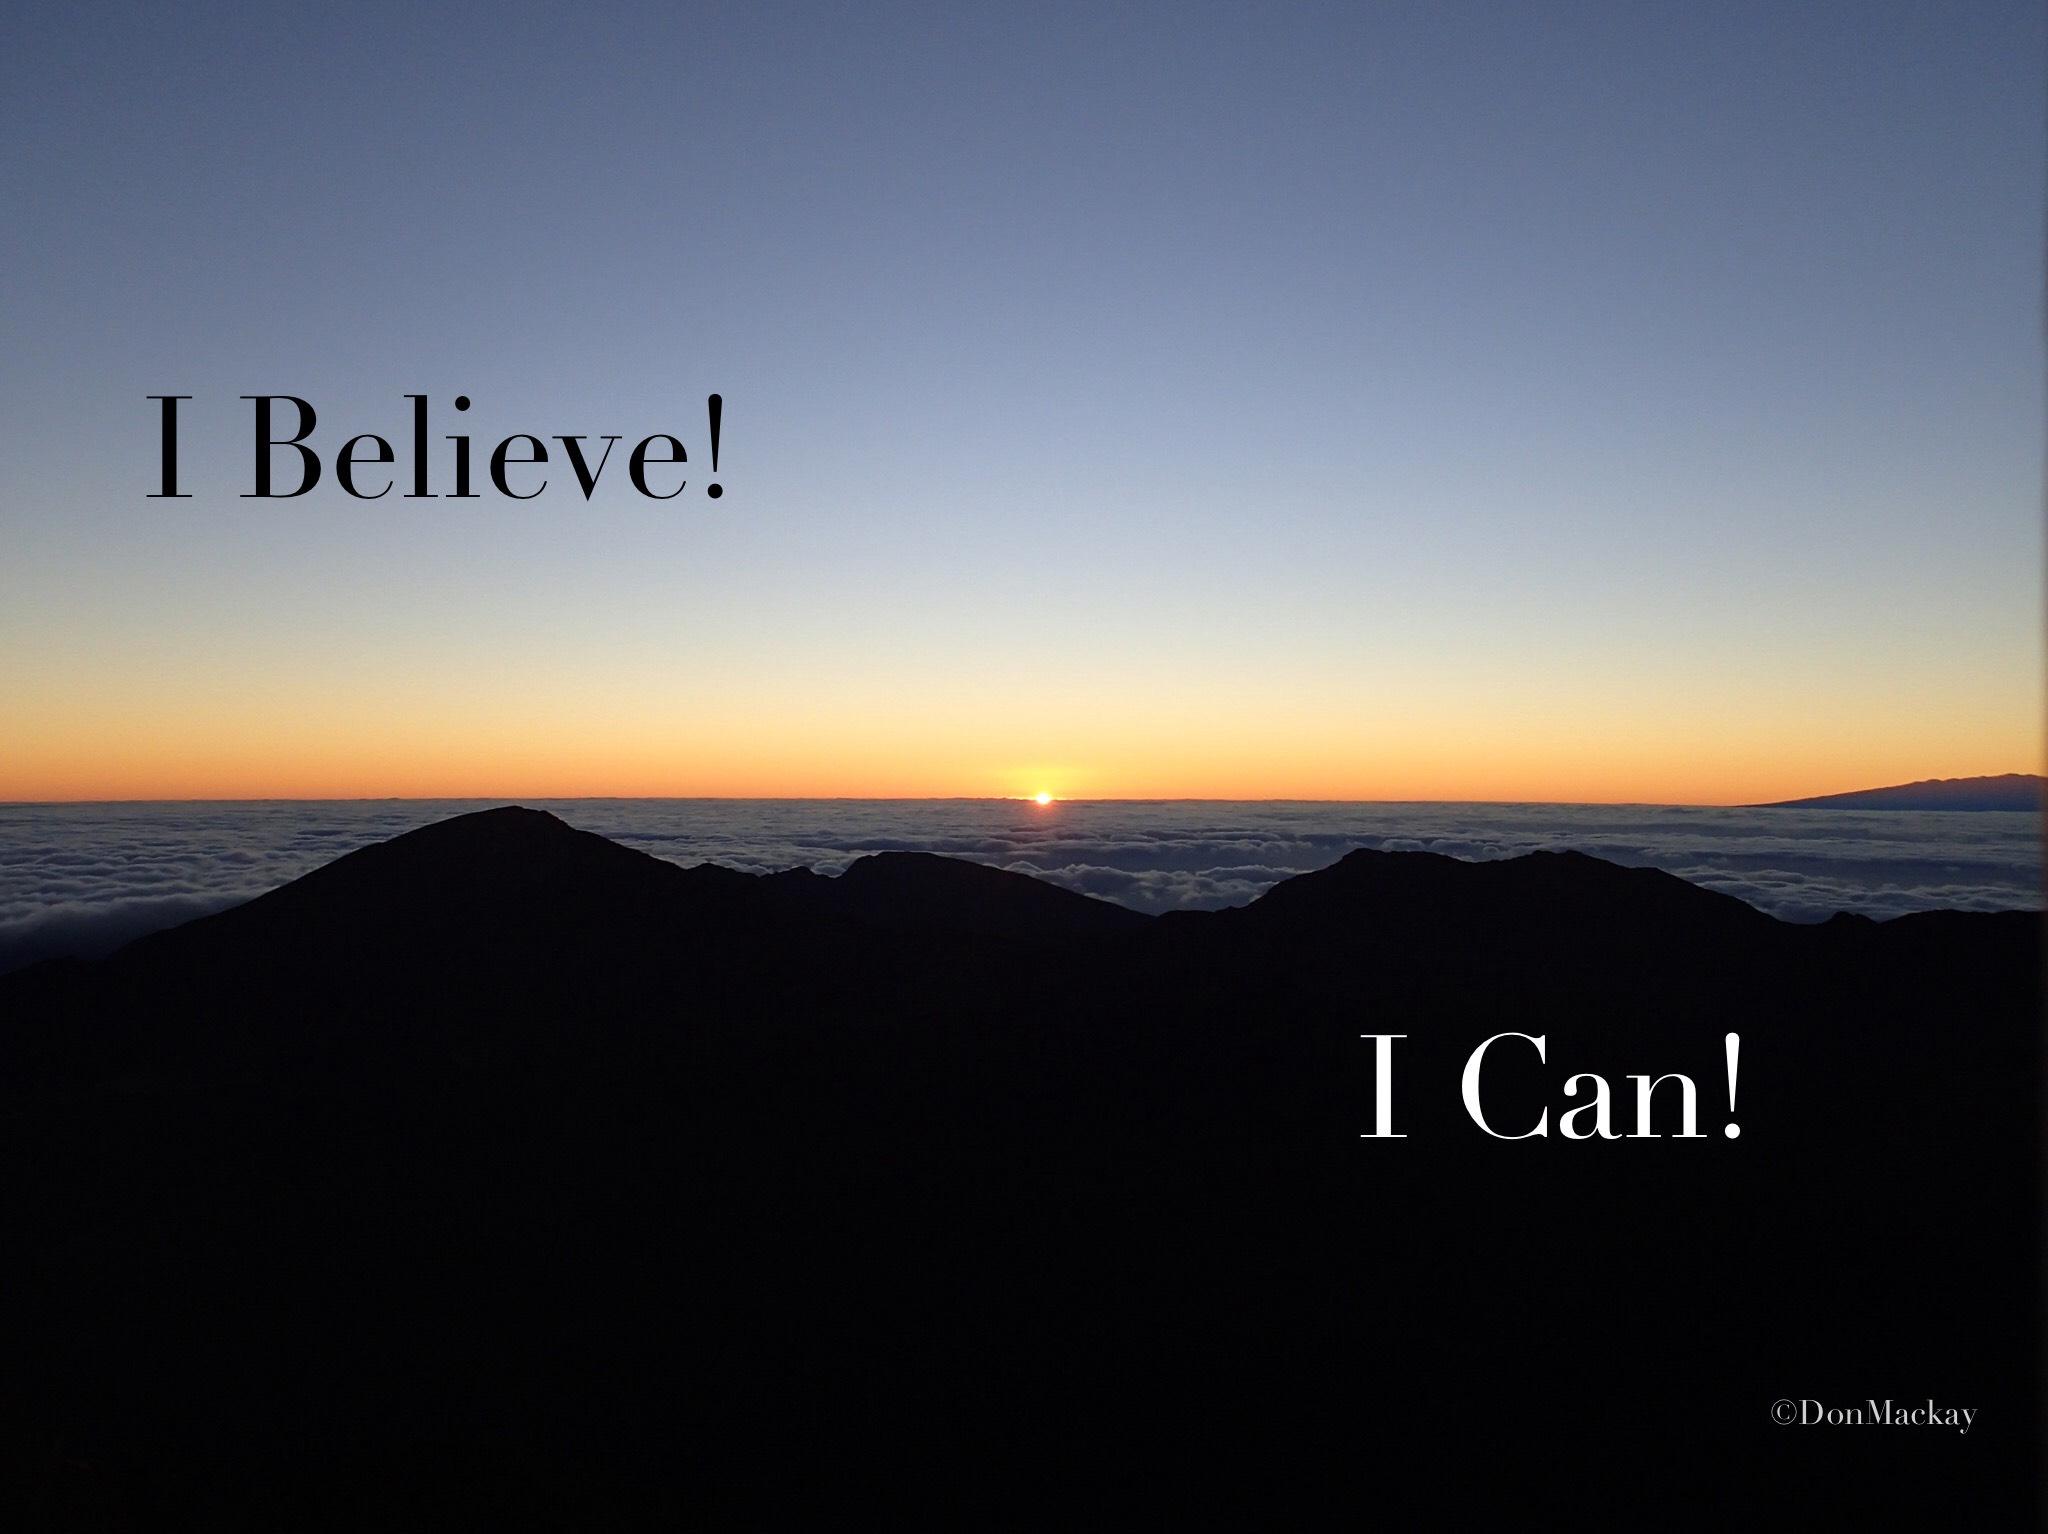 Gratefully Appreciating what I believe!